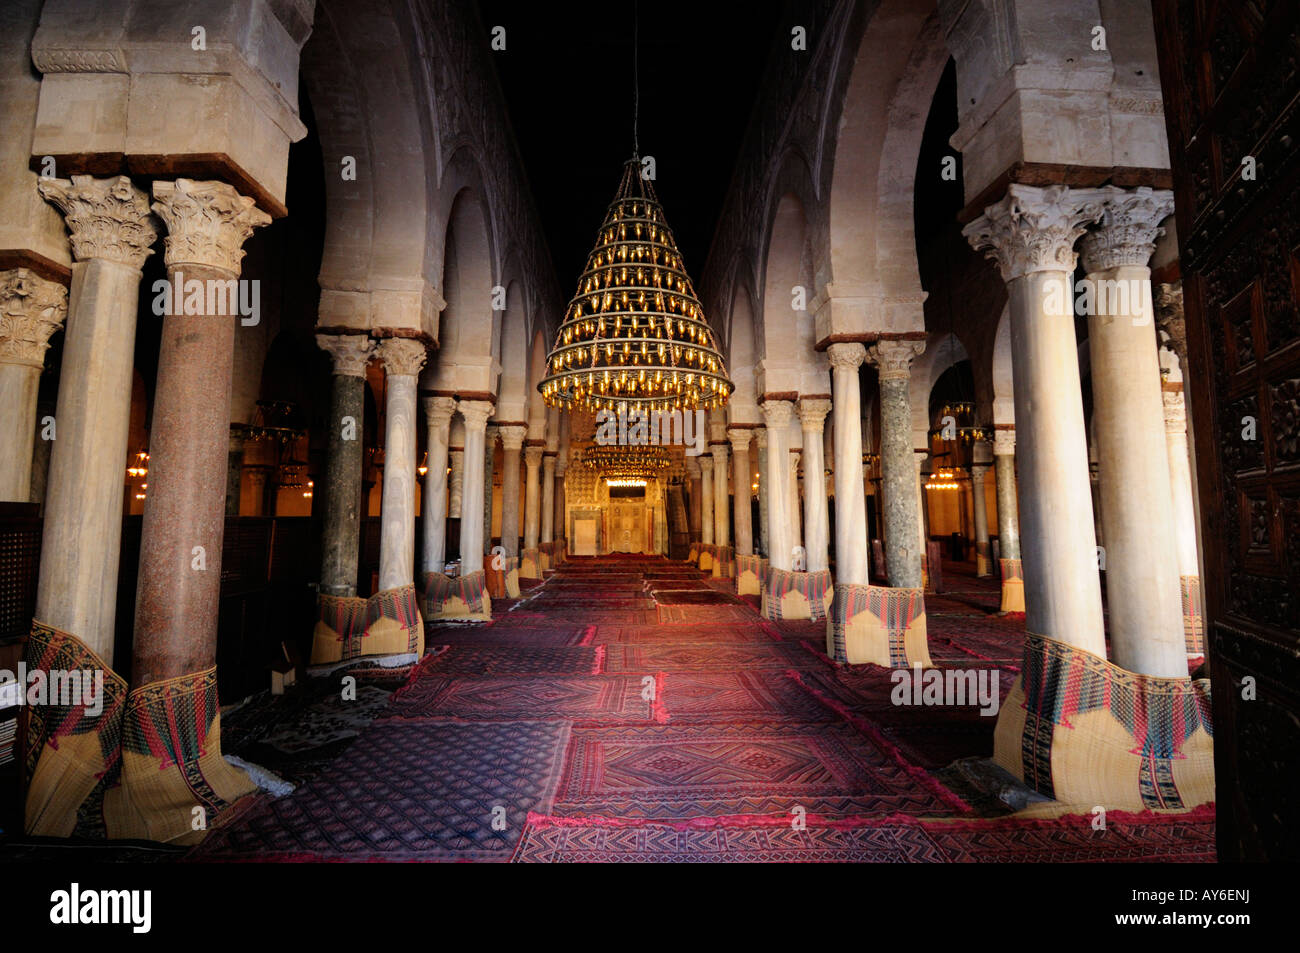 Prayer Hall of the Great Mosque, Kairouan, Tunisia - Stock Image